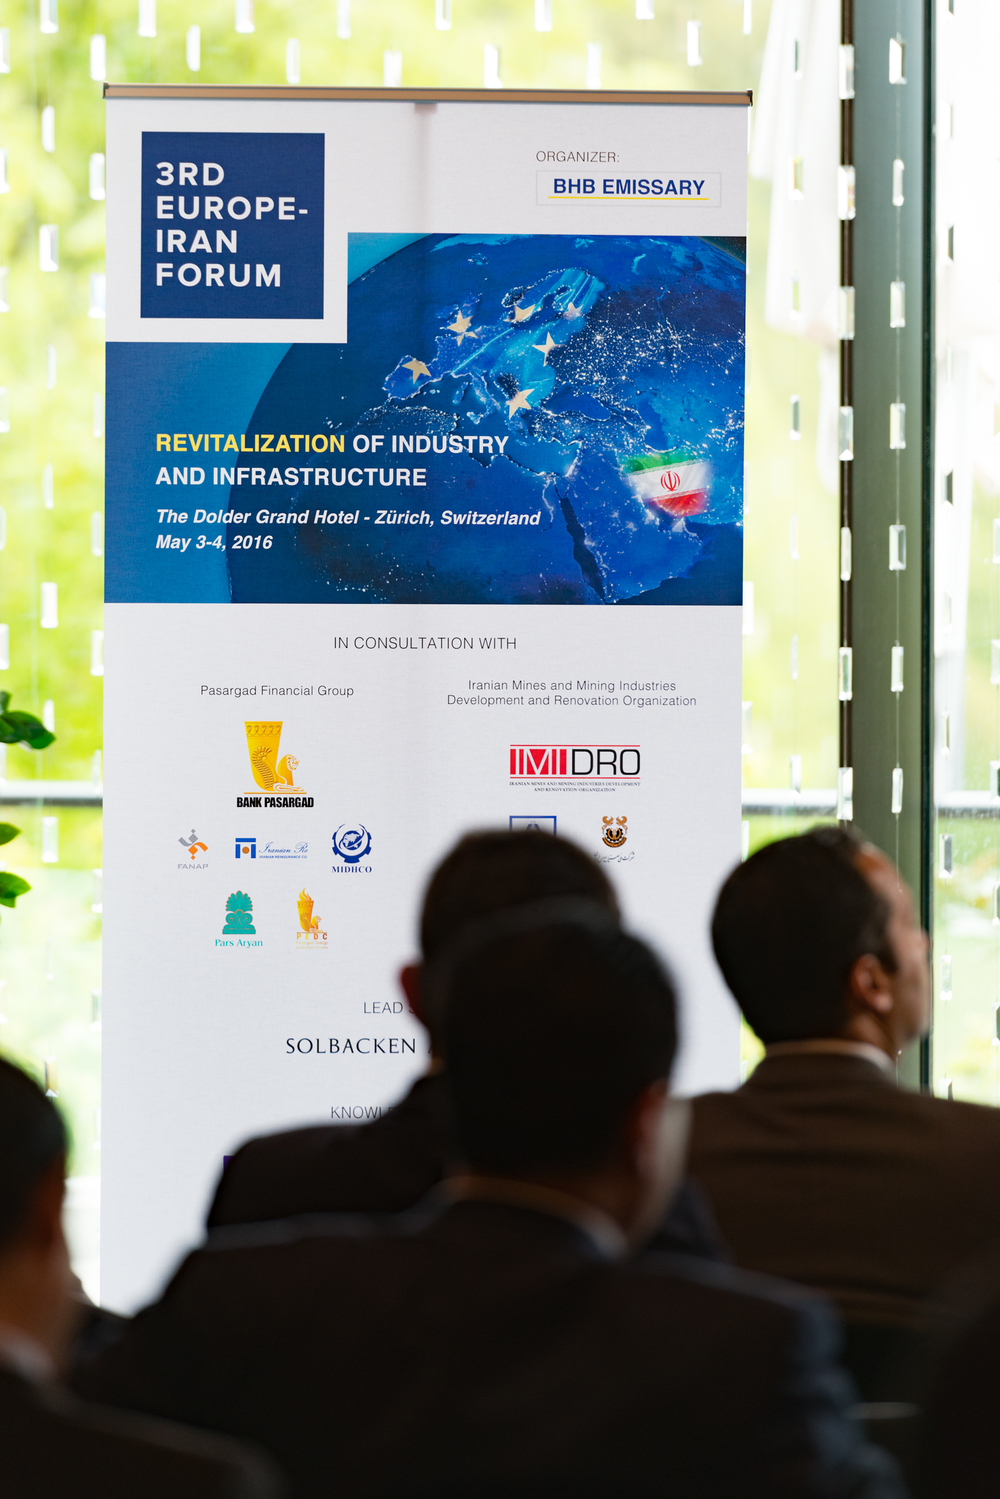 103.3rd Europe-Iran Forum_3.05.2016-Mai16.jpg